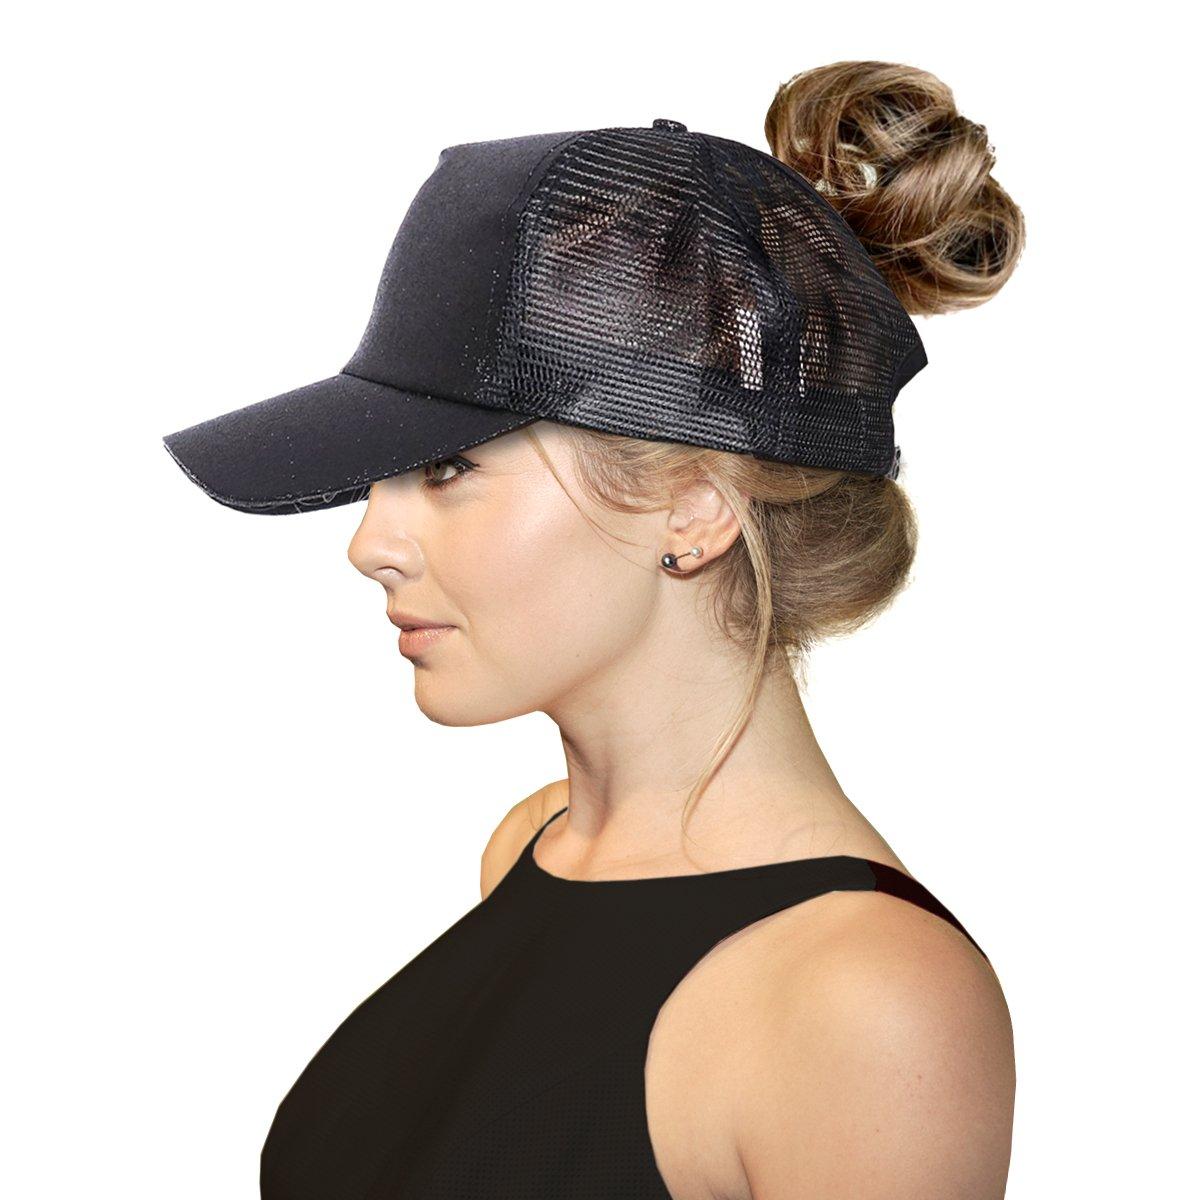 FADA Black Glitter Ponytail Baseball Cap for High Ponytail Women Girl Messy Bun Shinny Ponycaps Baseball Hat